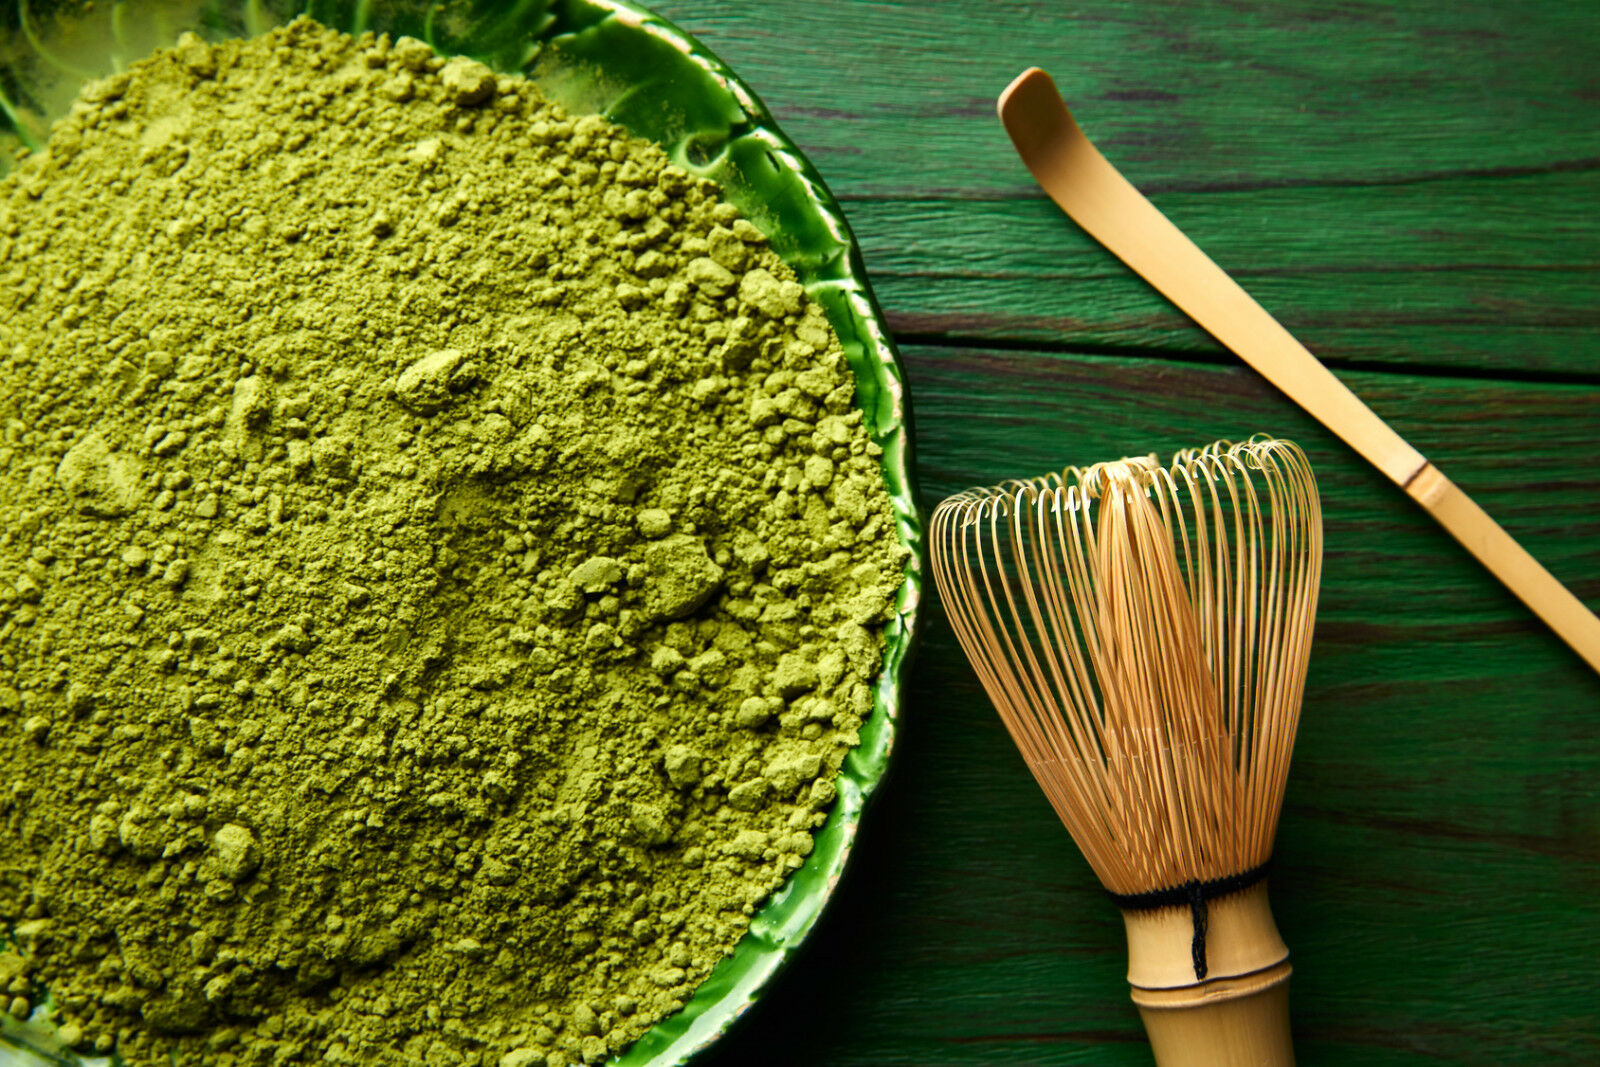 500 g BIO Matcha Tee in Pulverform - grüner Matcha | Grüntee | Tea | Pur |